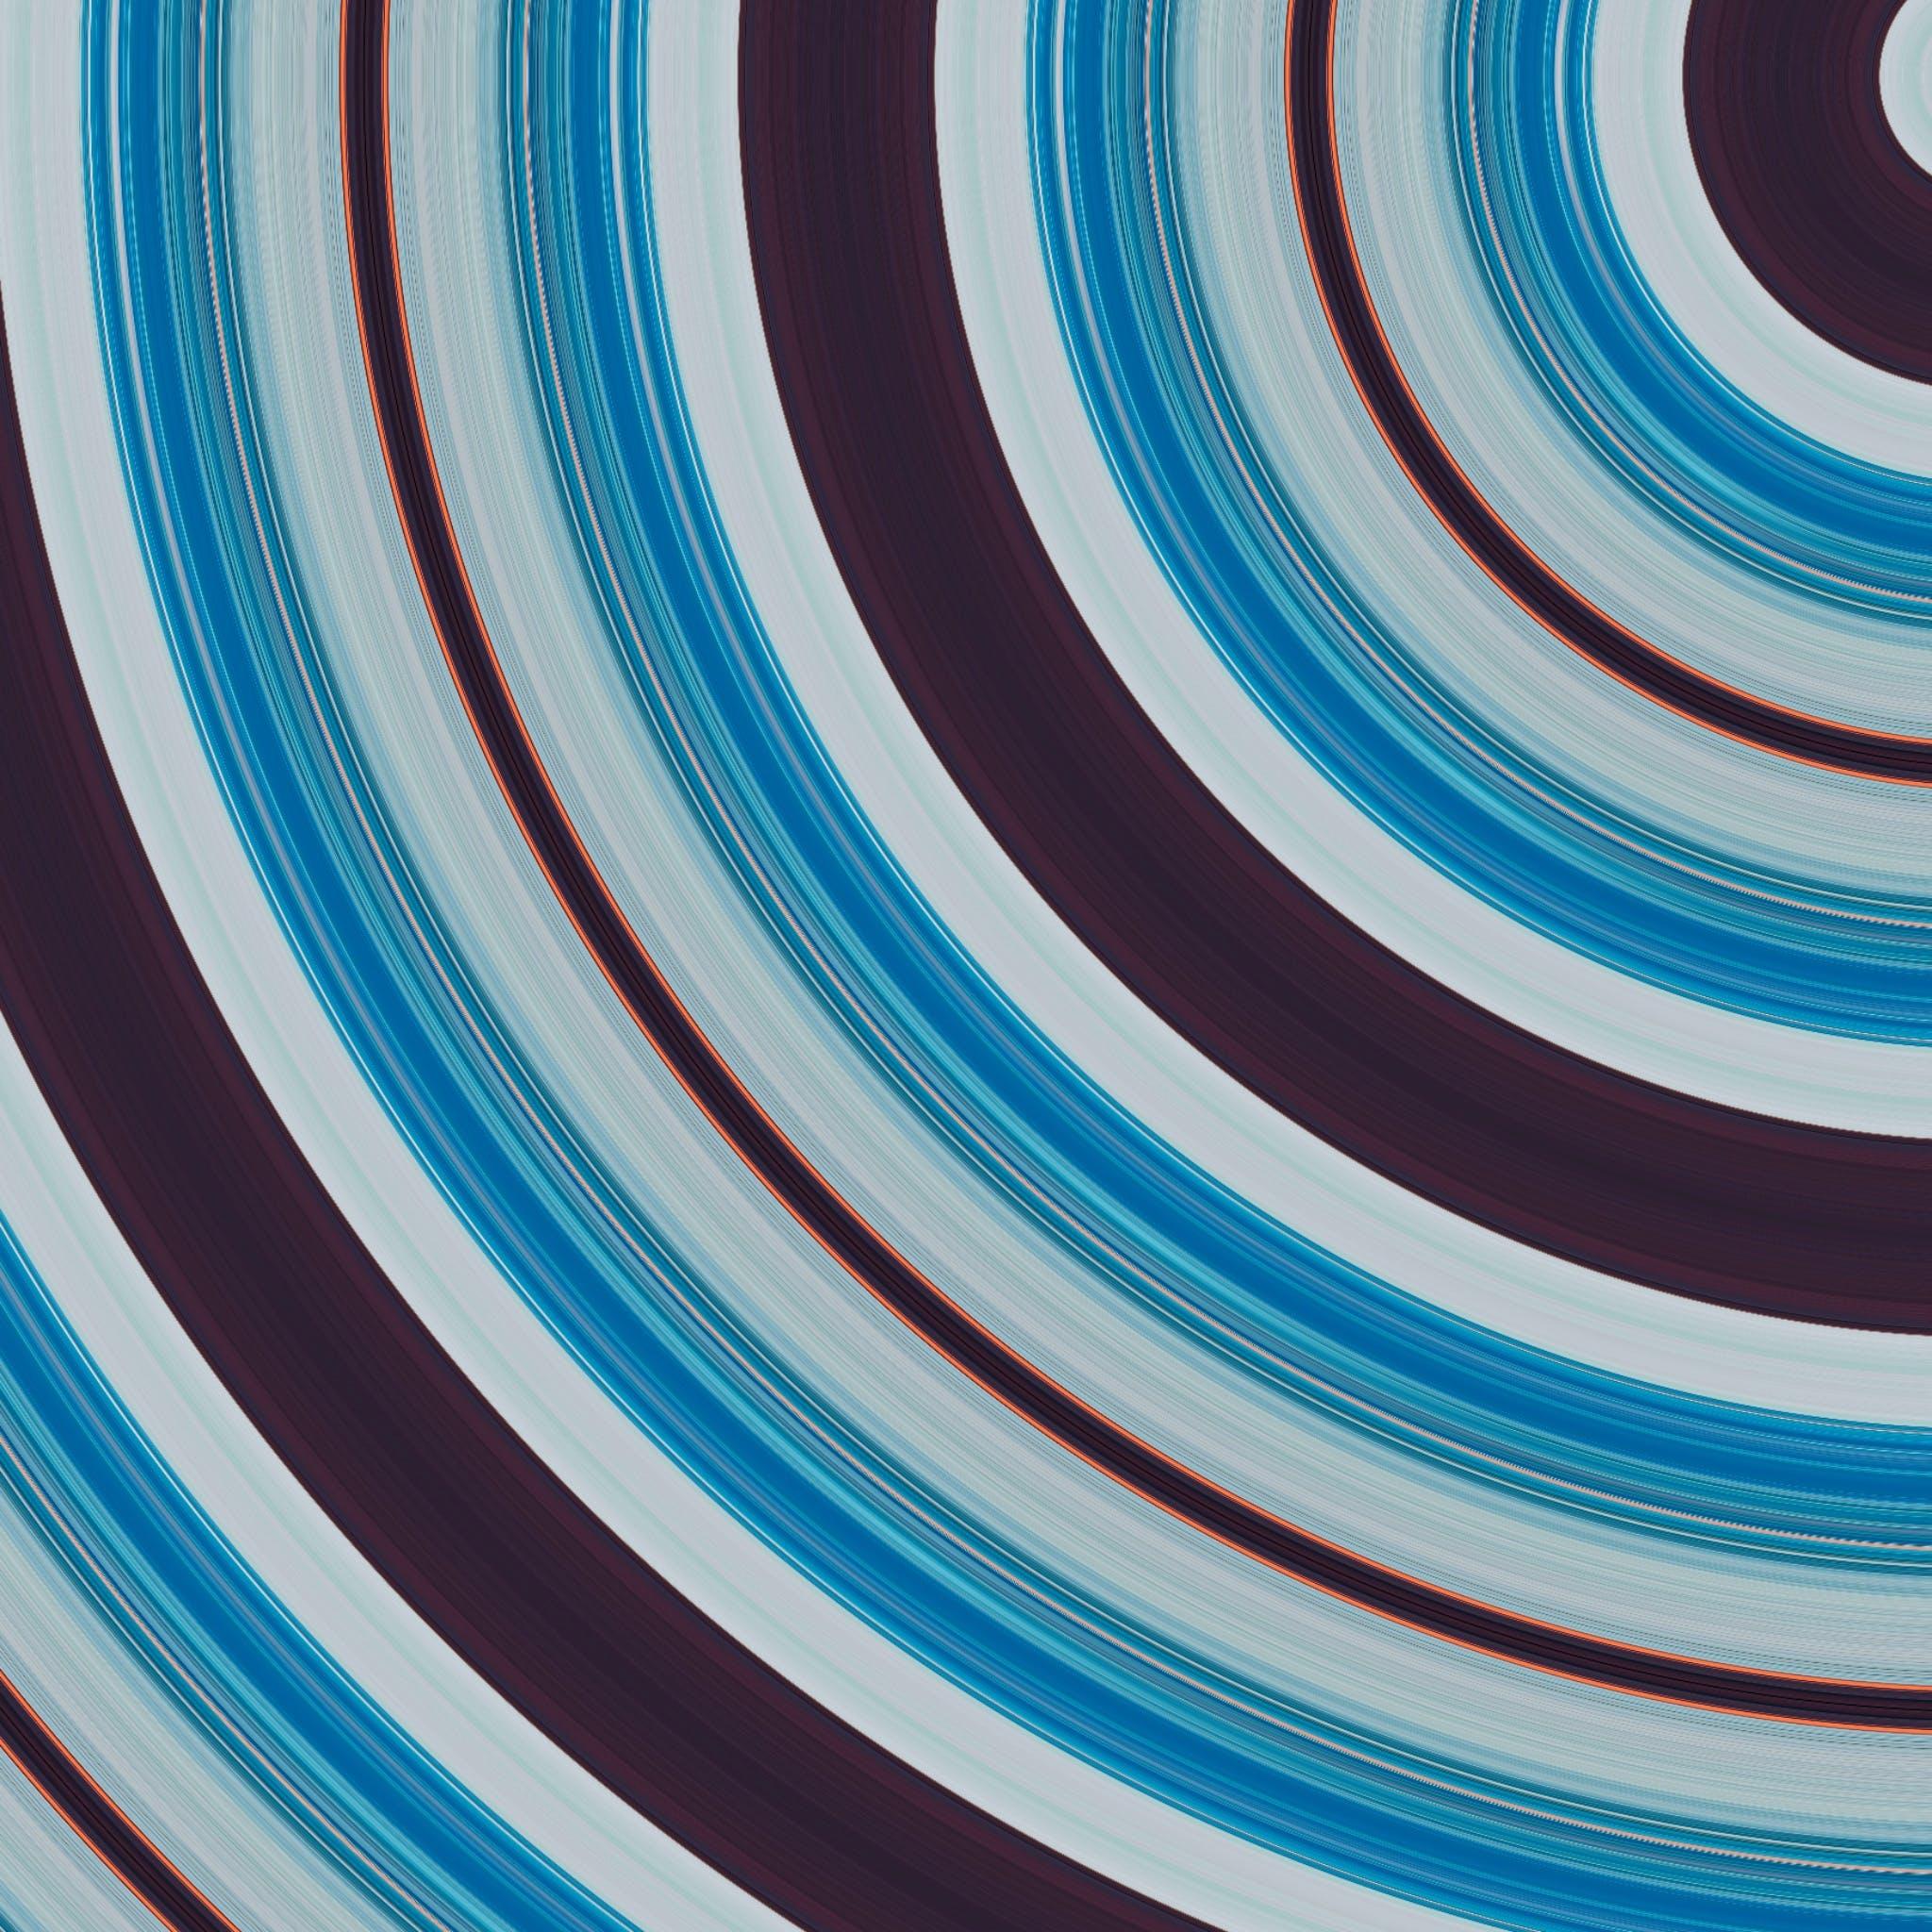 Základová fotografie zdarma na téma abstraktní obraz, barevný, barvy, design